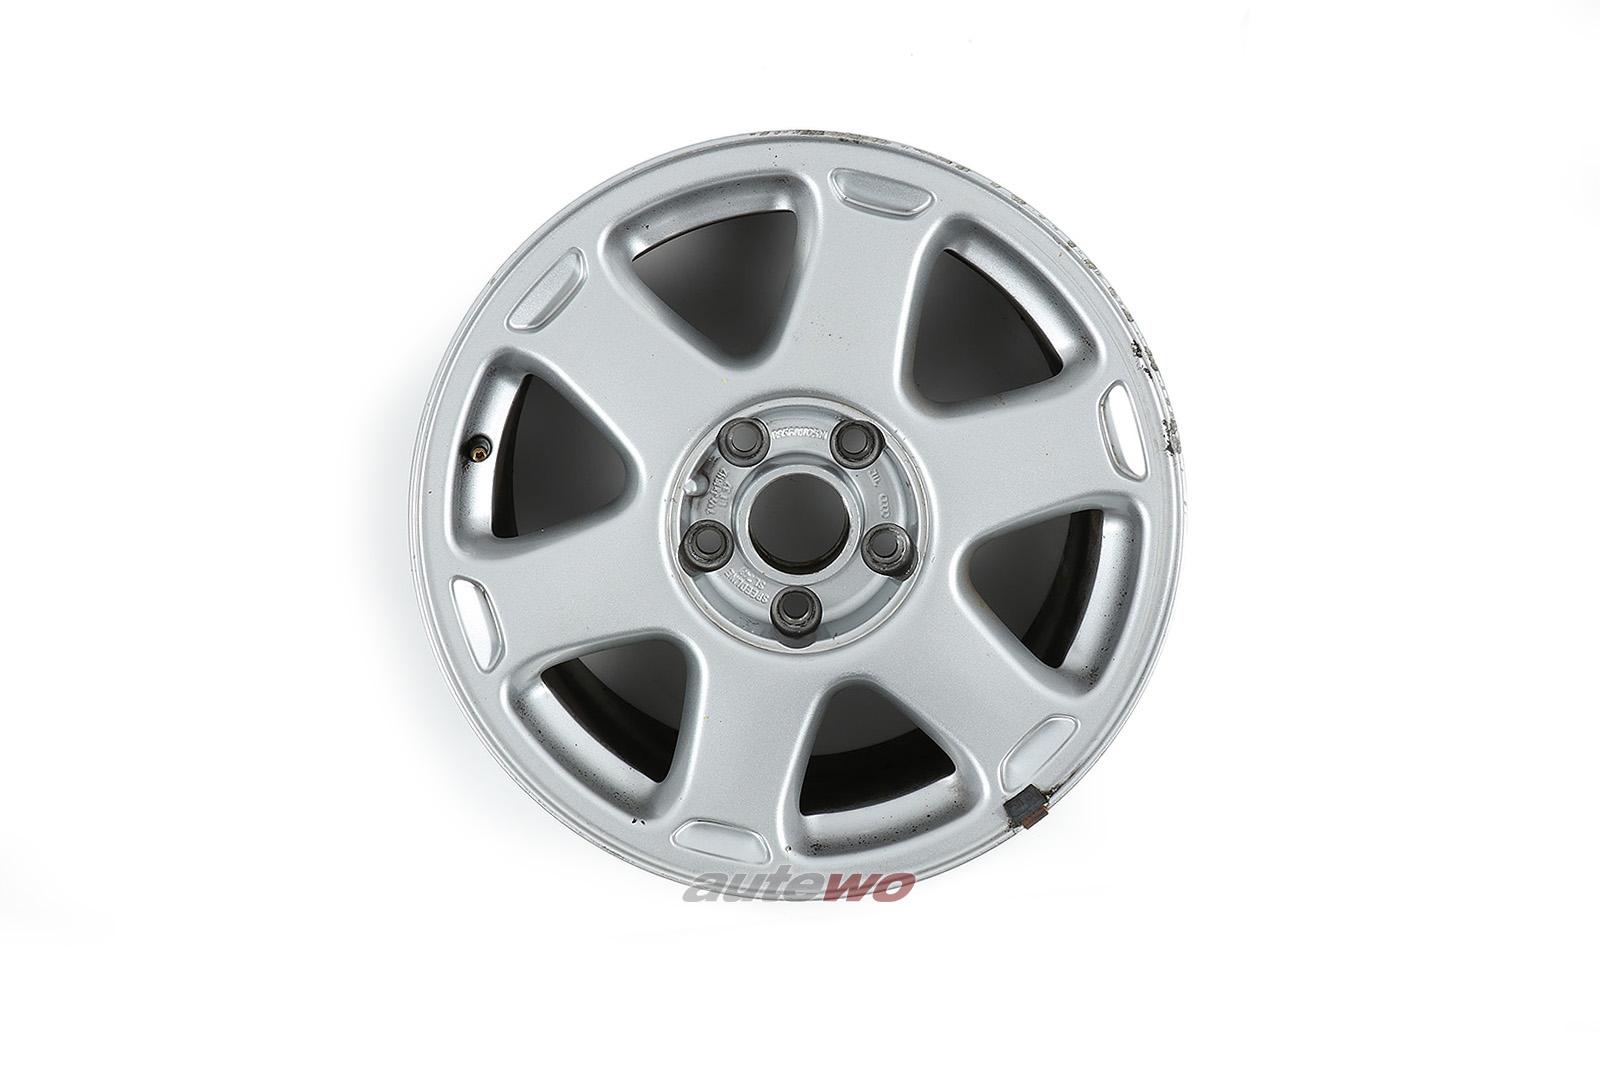 895601025M Audi Coupe 89/B4/S2/S4/S6 C4 AVUS-Felge 7,5x16 ET37 5x112